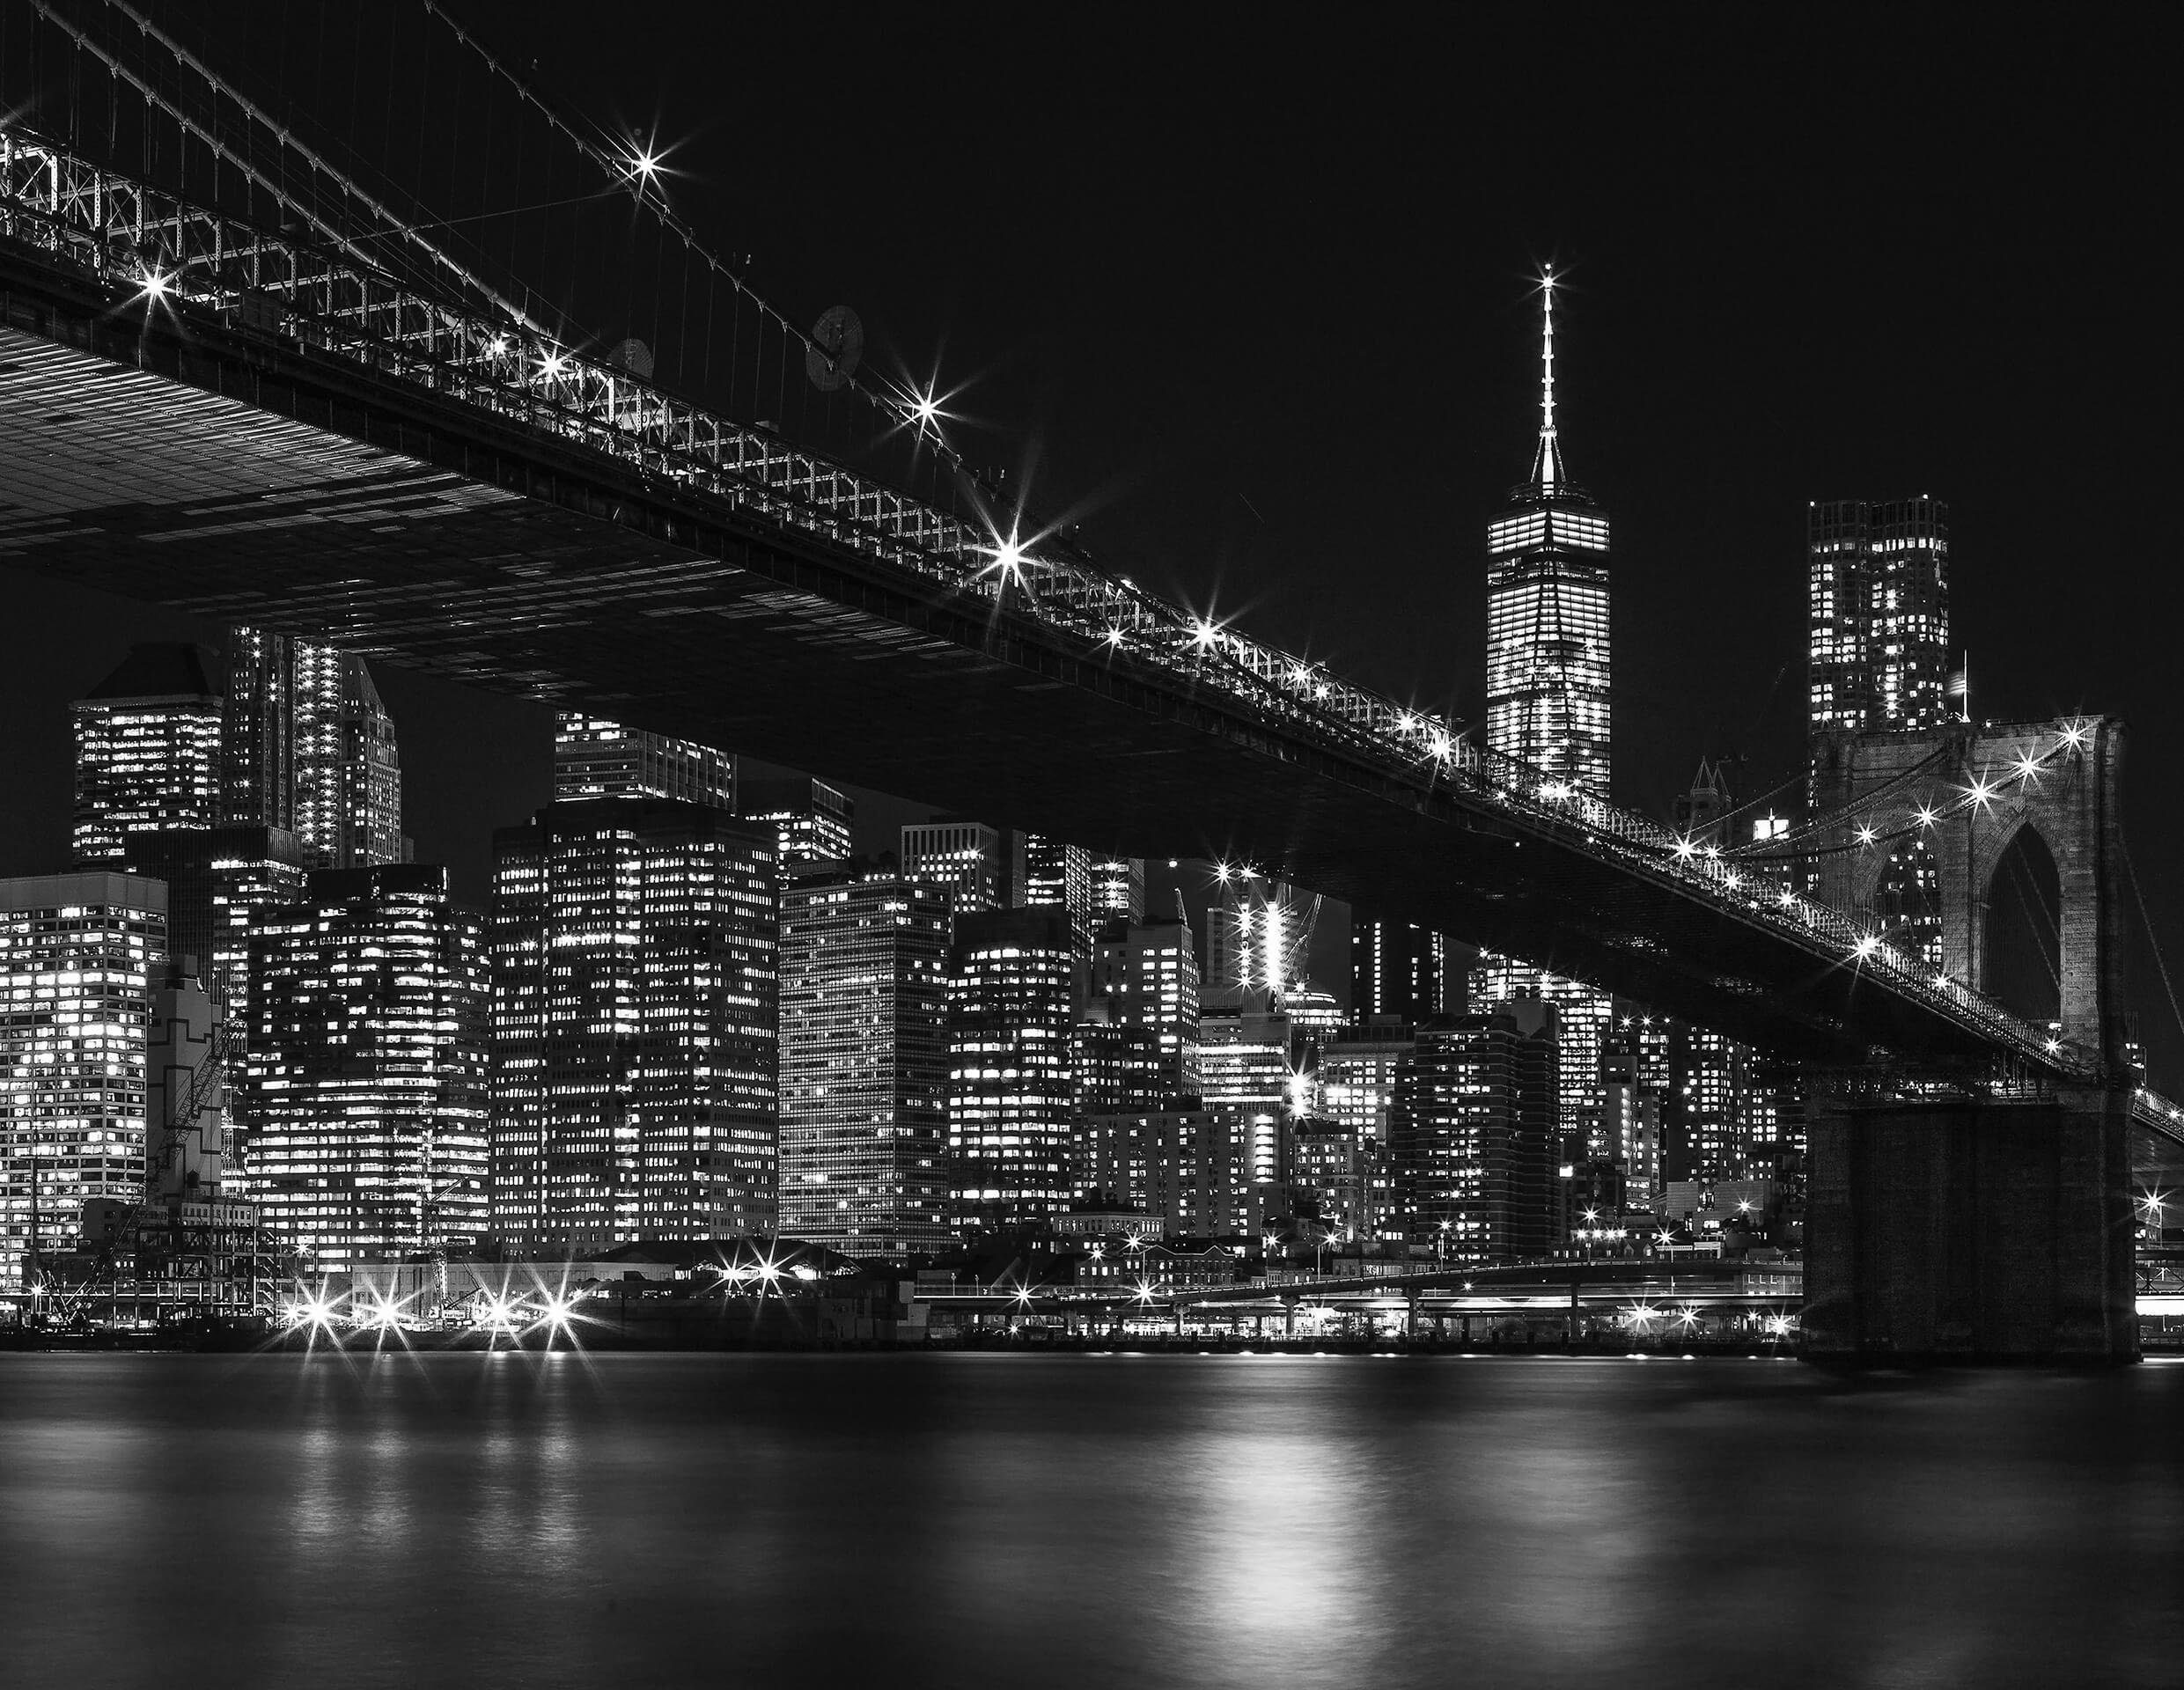 Fototapete, living walls, »Brooklyn Bridge«, Vlies glatt